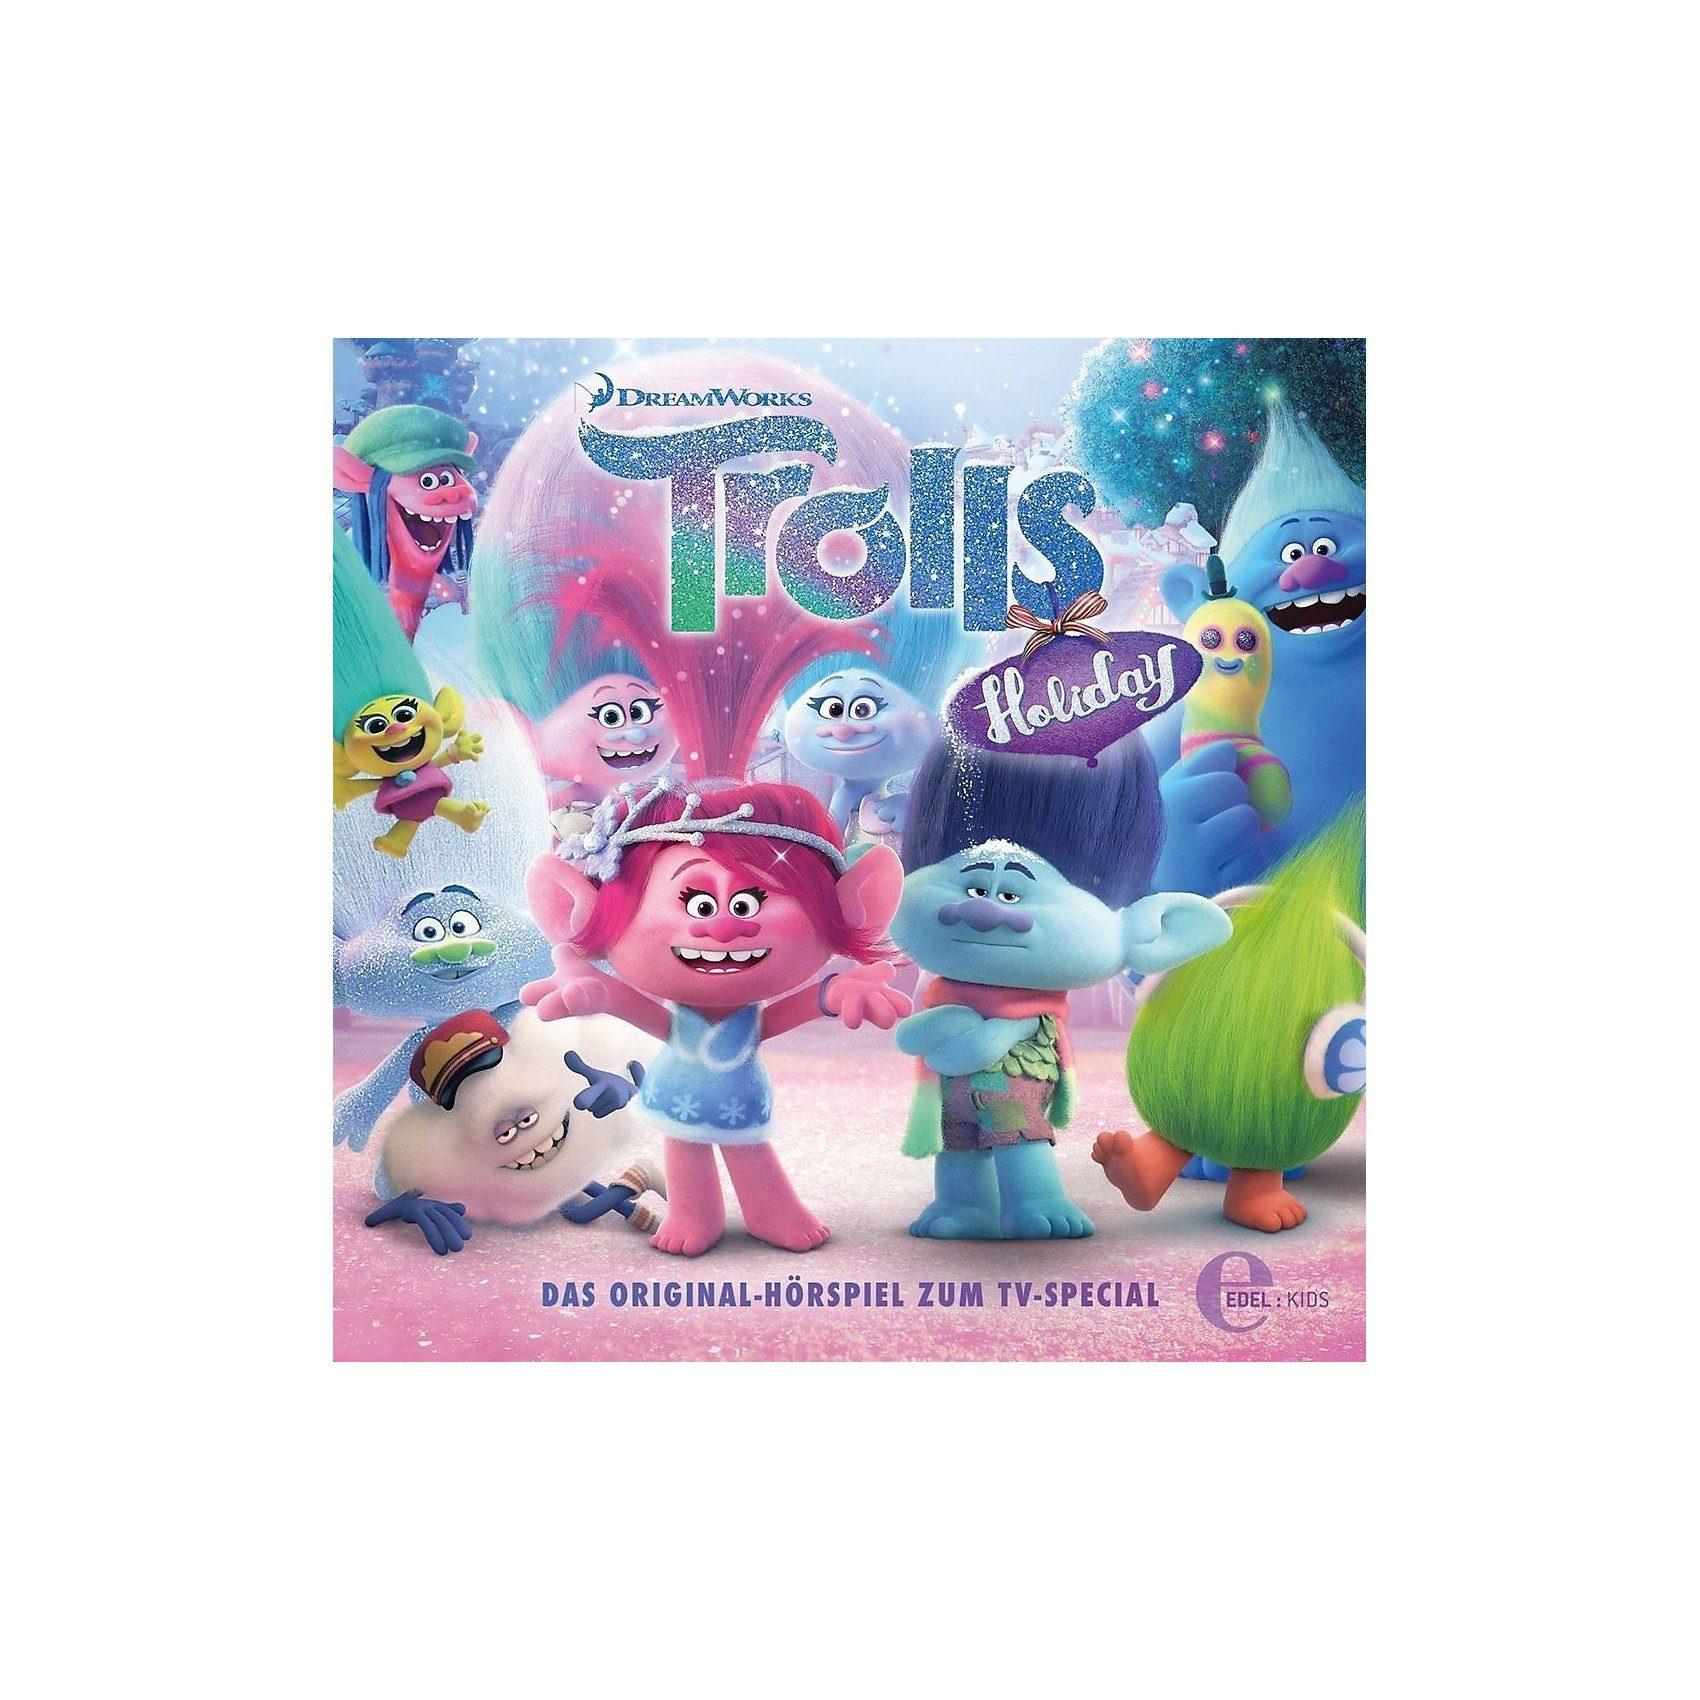 Edel CD Trolls - Hörspiel TV-Special